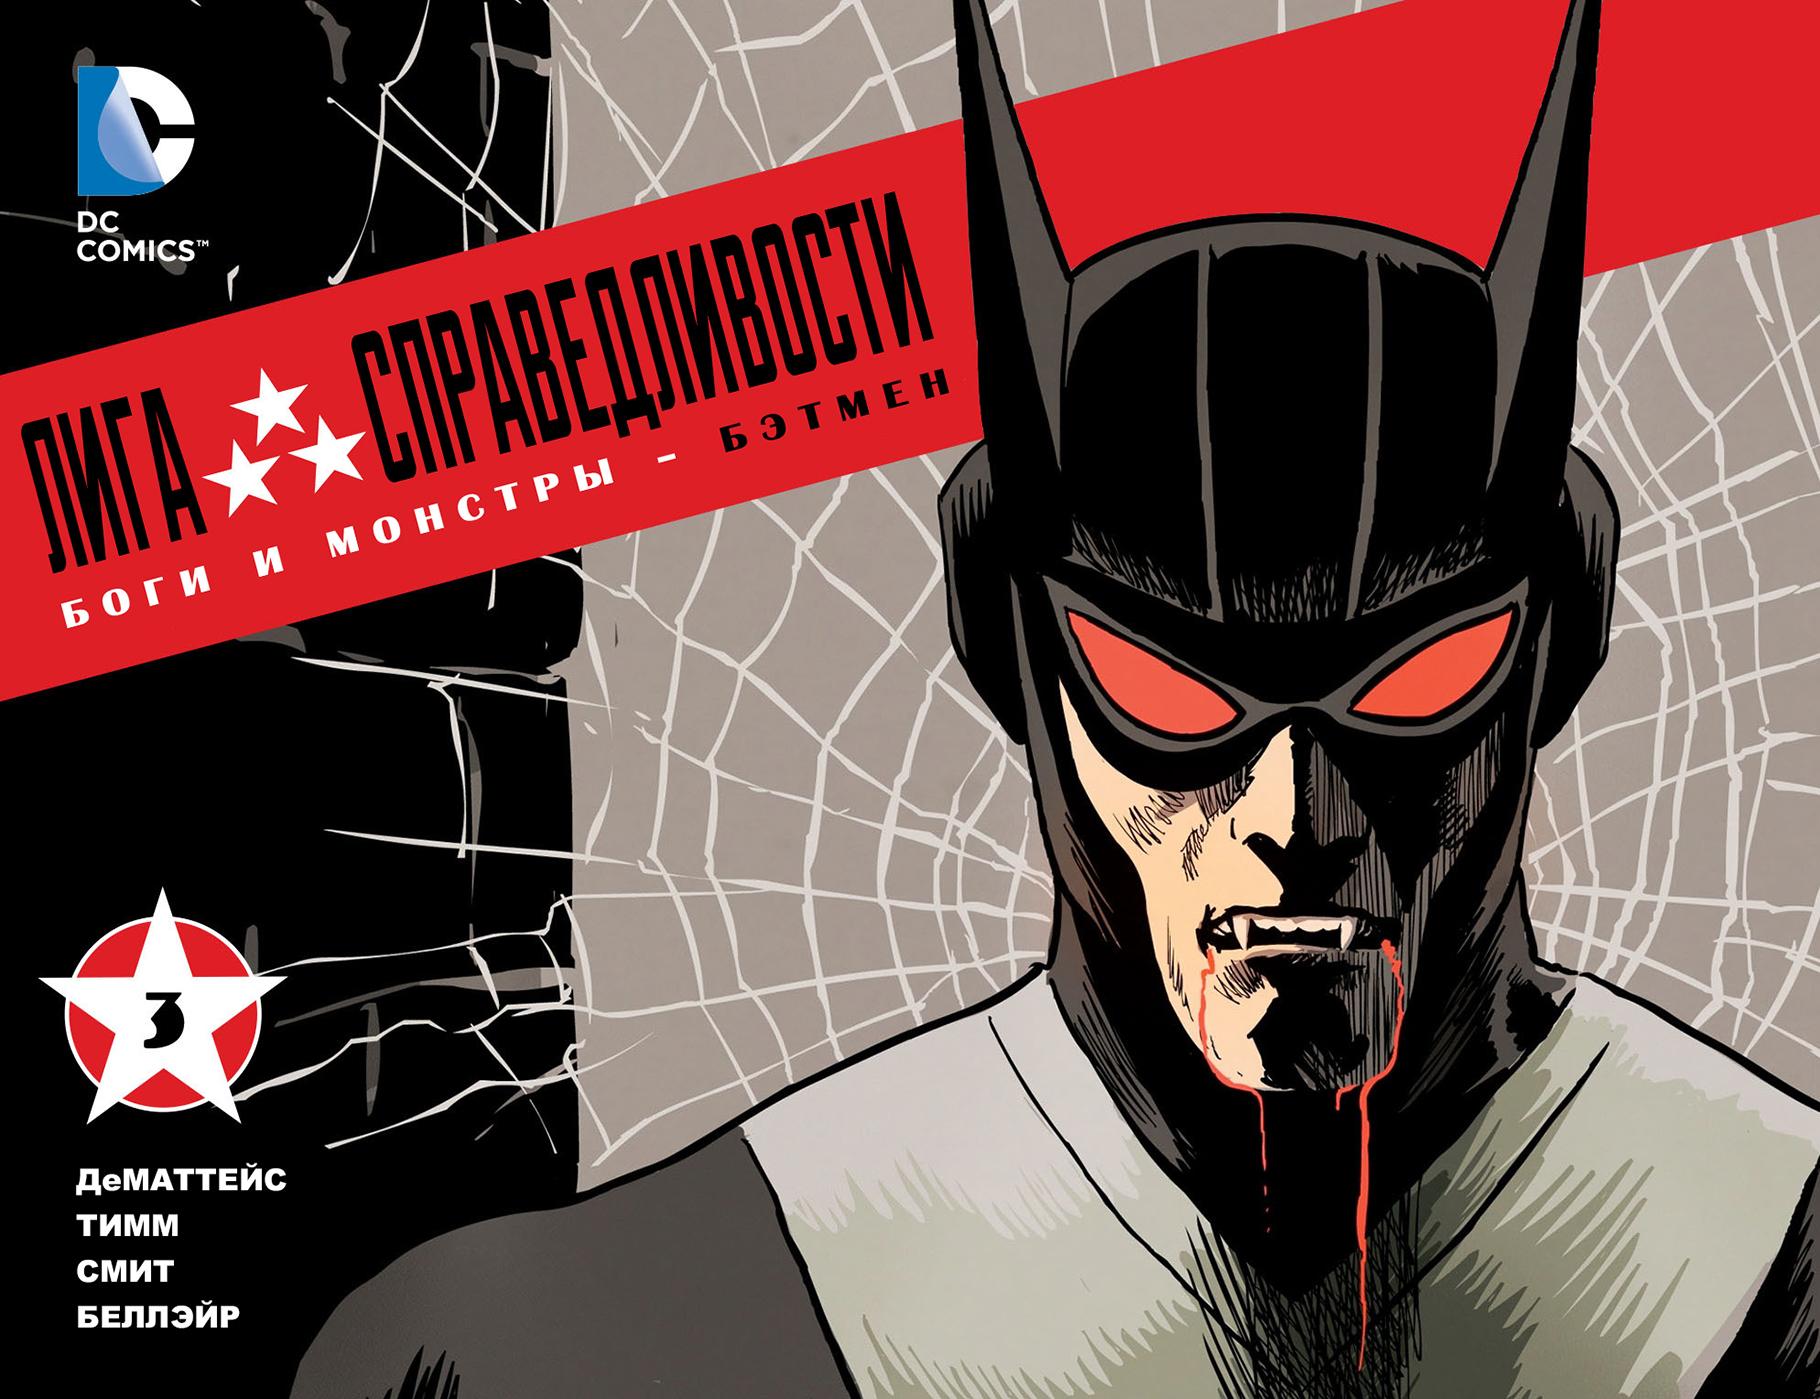 Комикс Лига Справедливости: Боги и монстры – Бэтмен